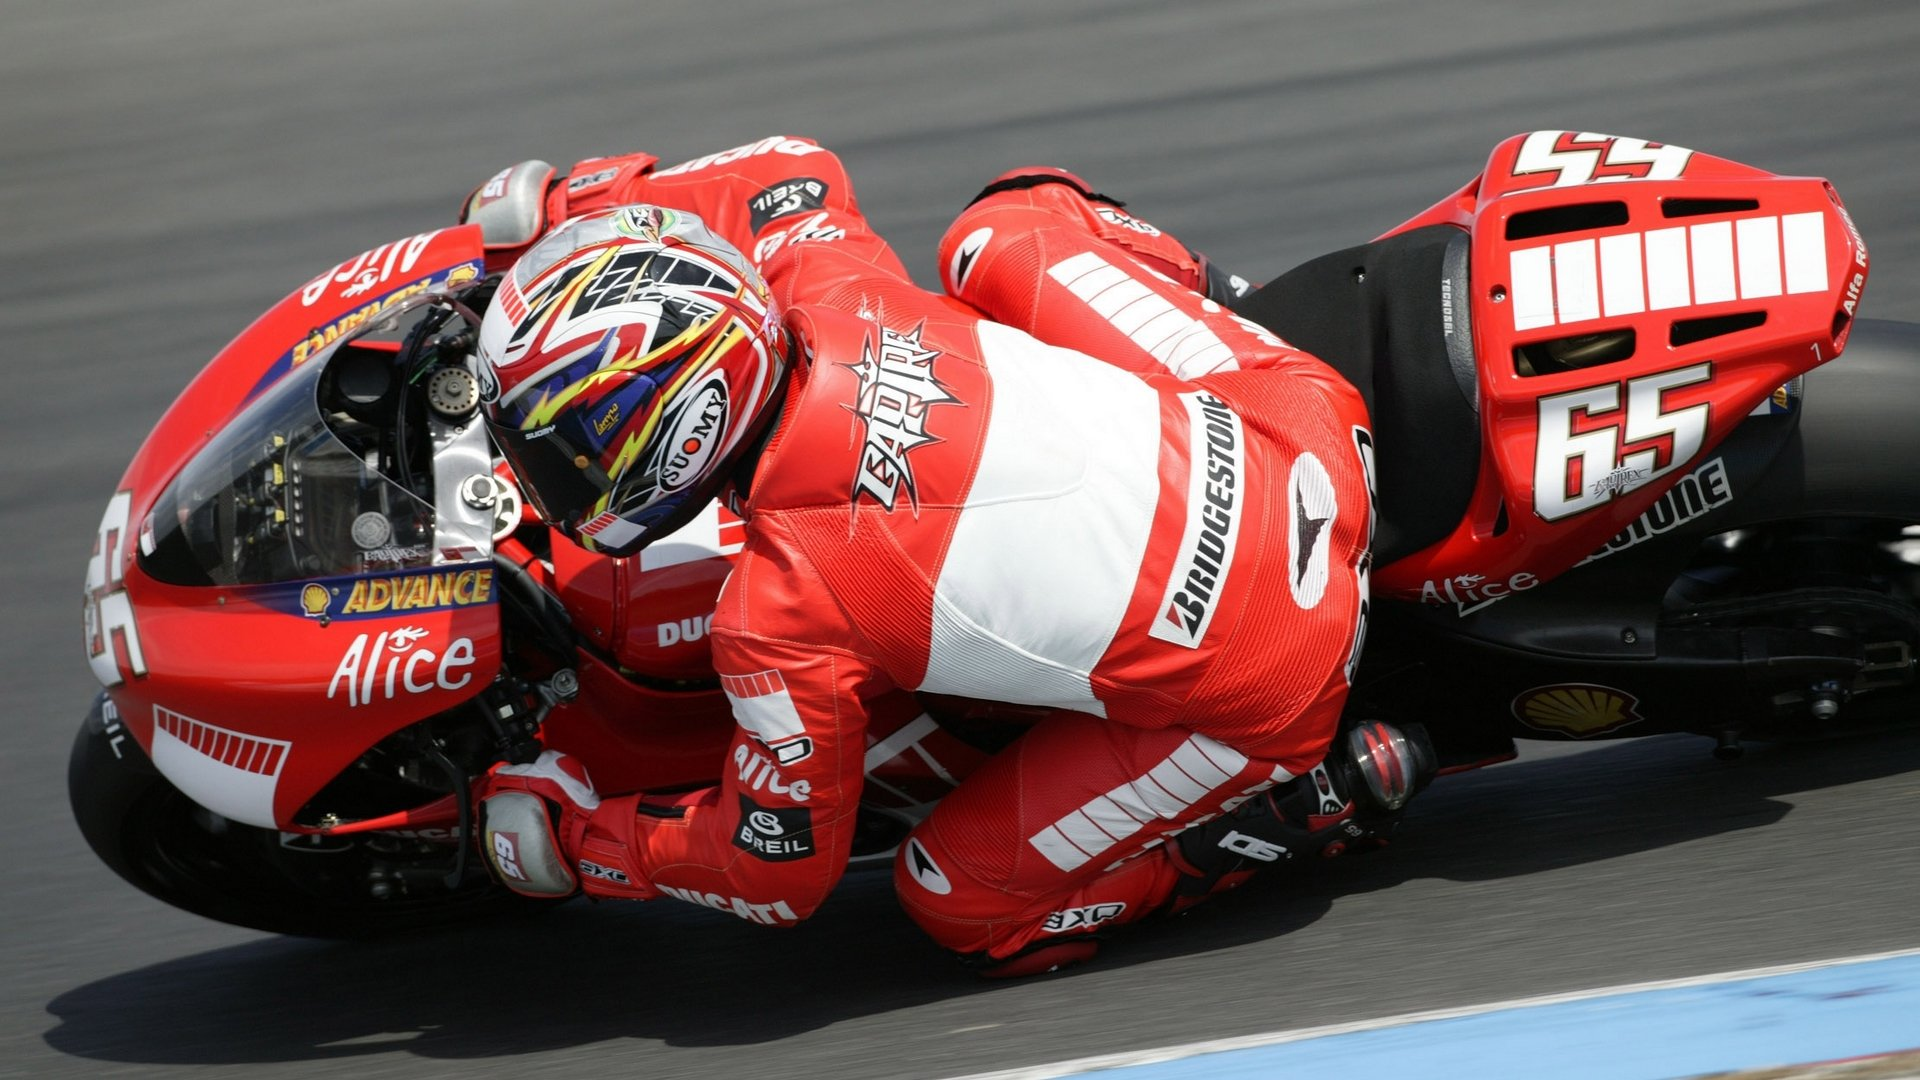 Motosport Motorcycle Moto Racing wallpaper